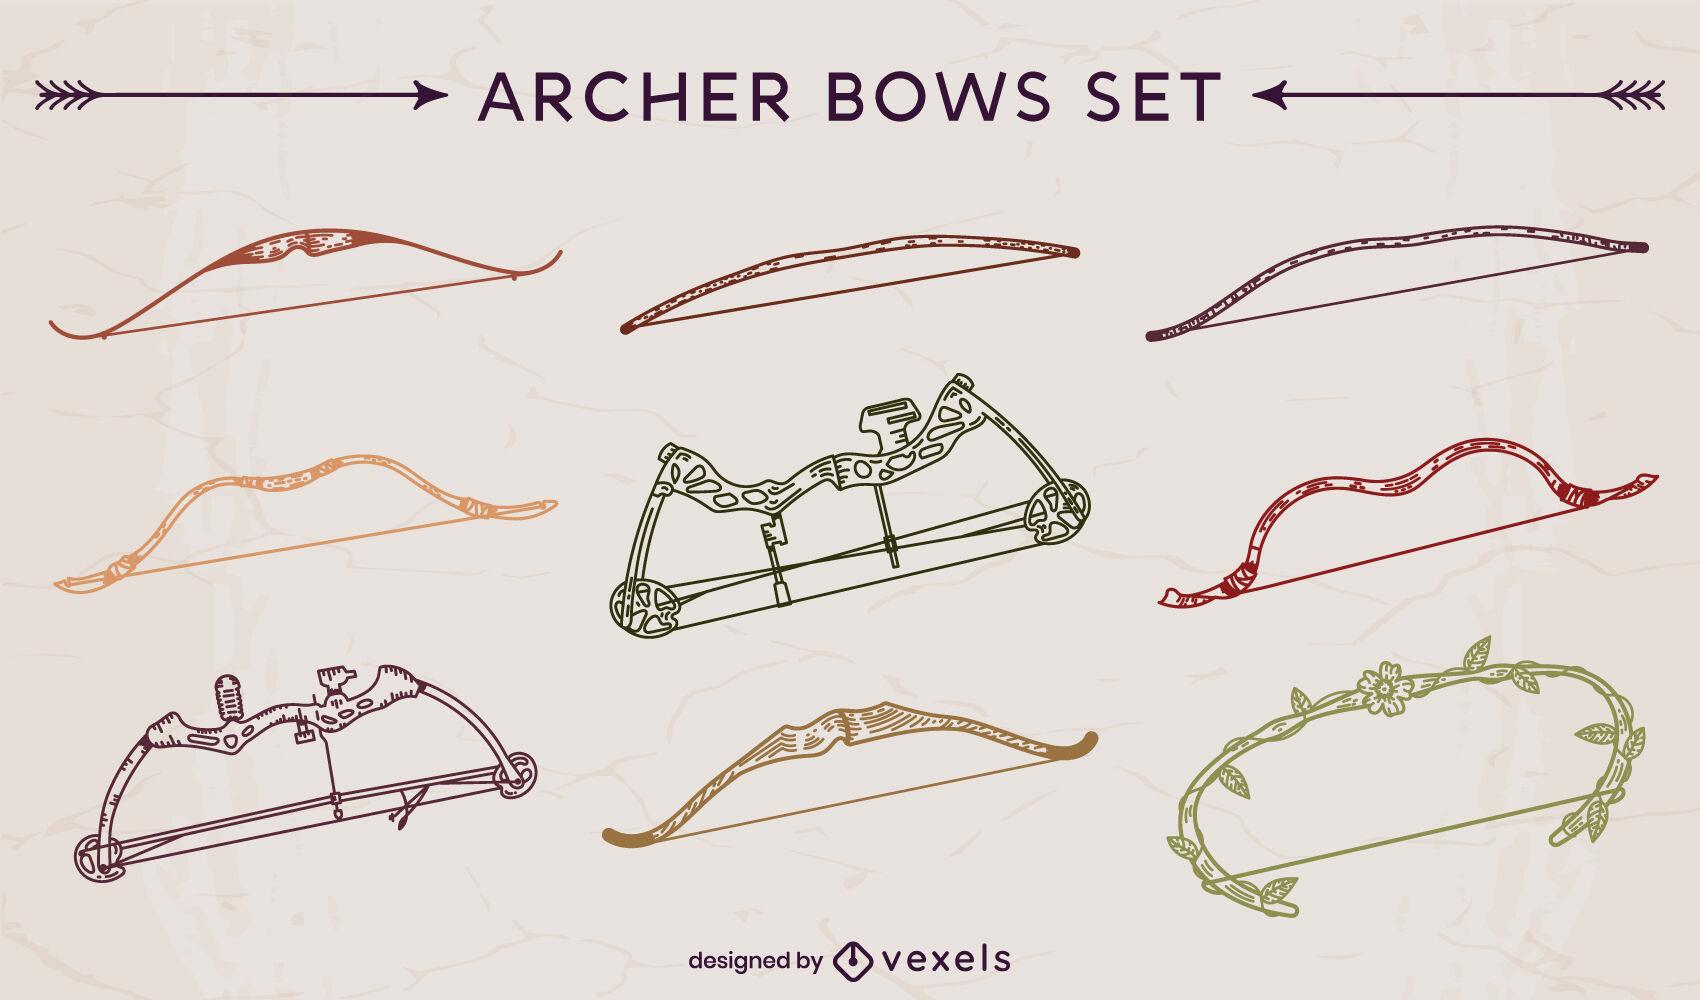 Archer bows stroke set